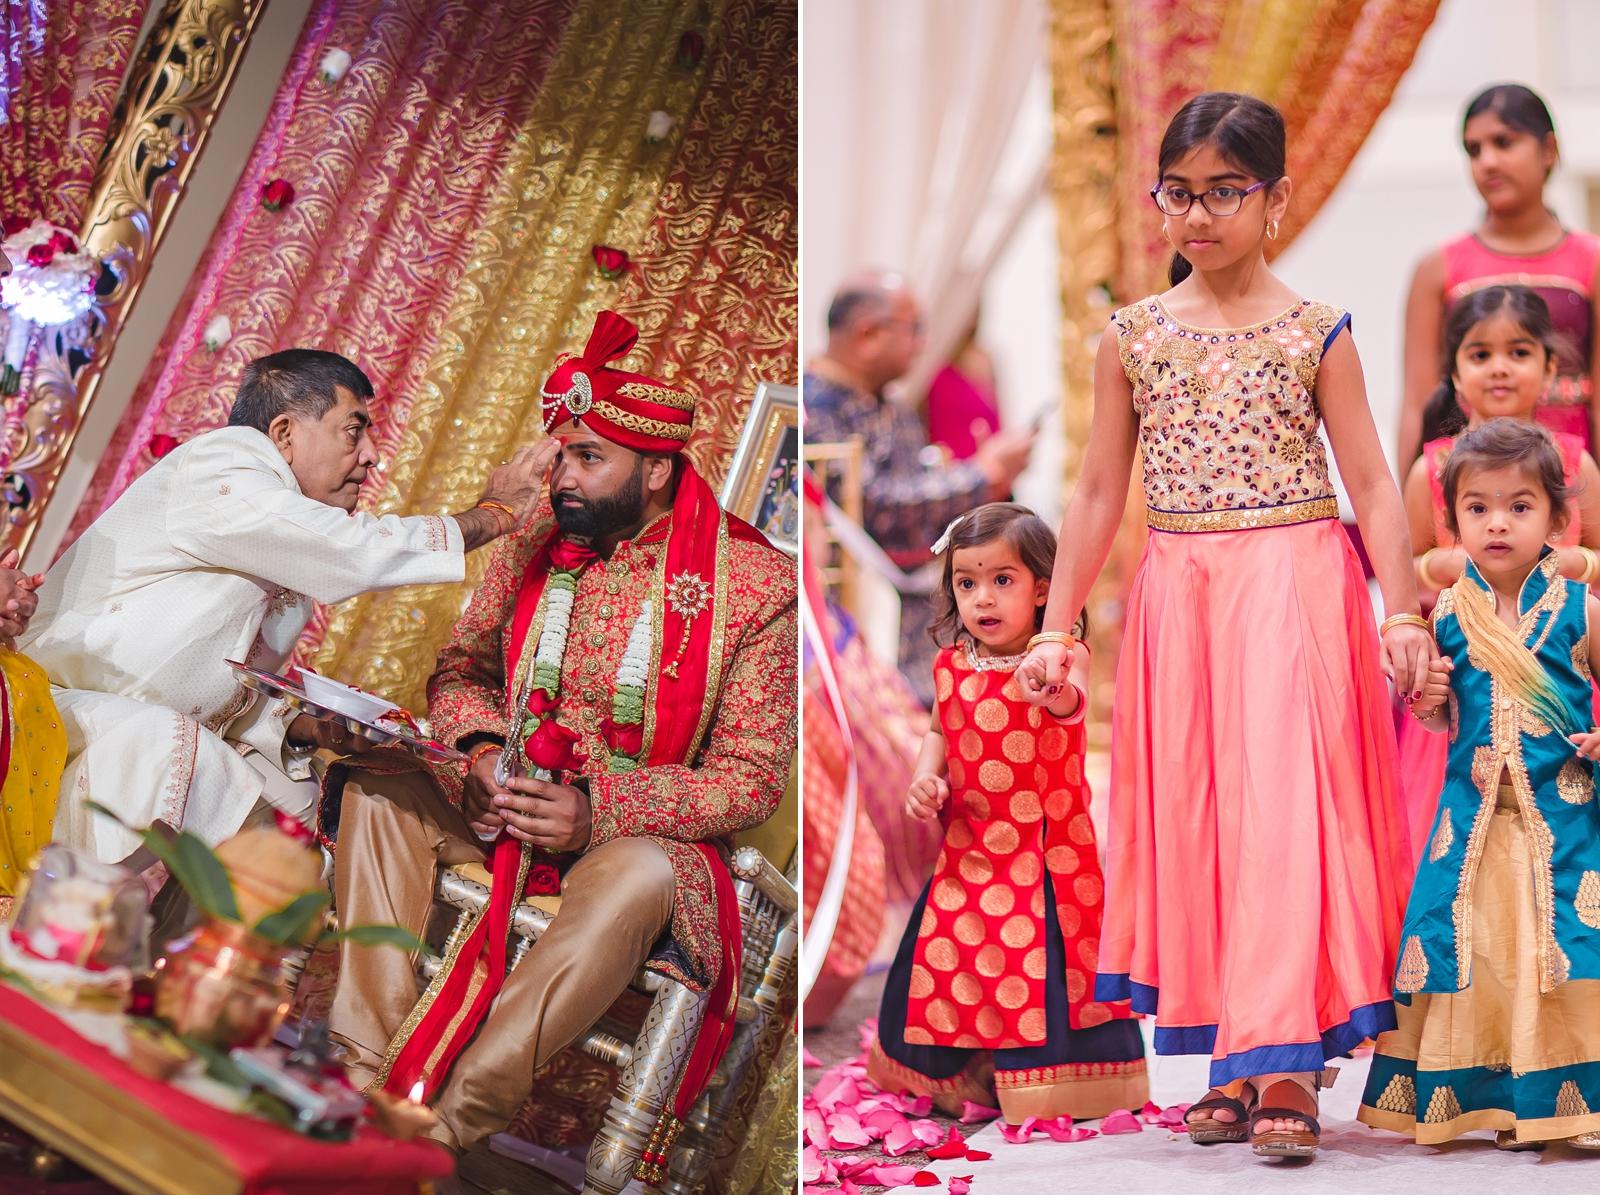 Ankoor + Binna, Miami Wedding Photographers | Häring Photography, Indian Wedding Photographer in Florida, Best Muslim, Hindu - South East Asian Wedding Photographers